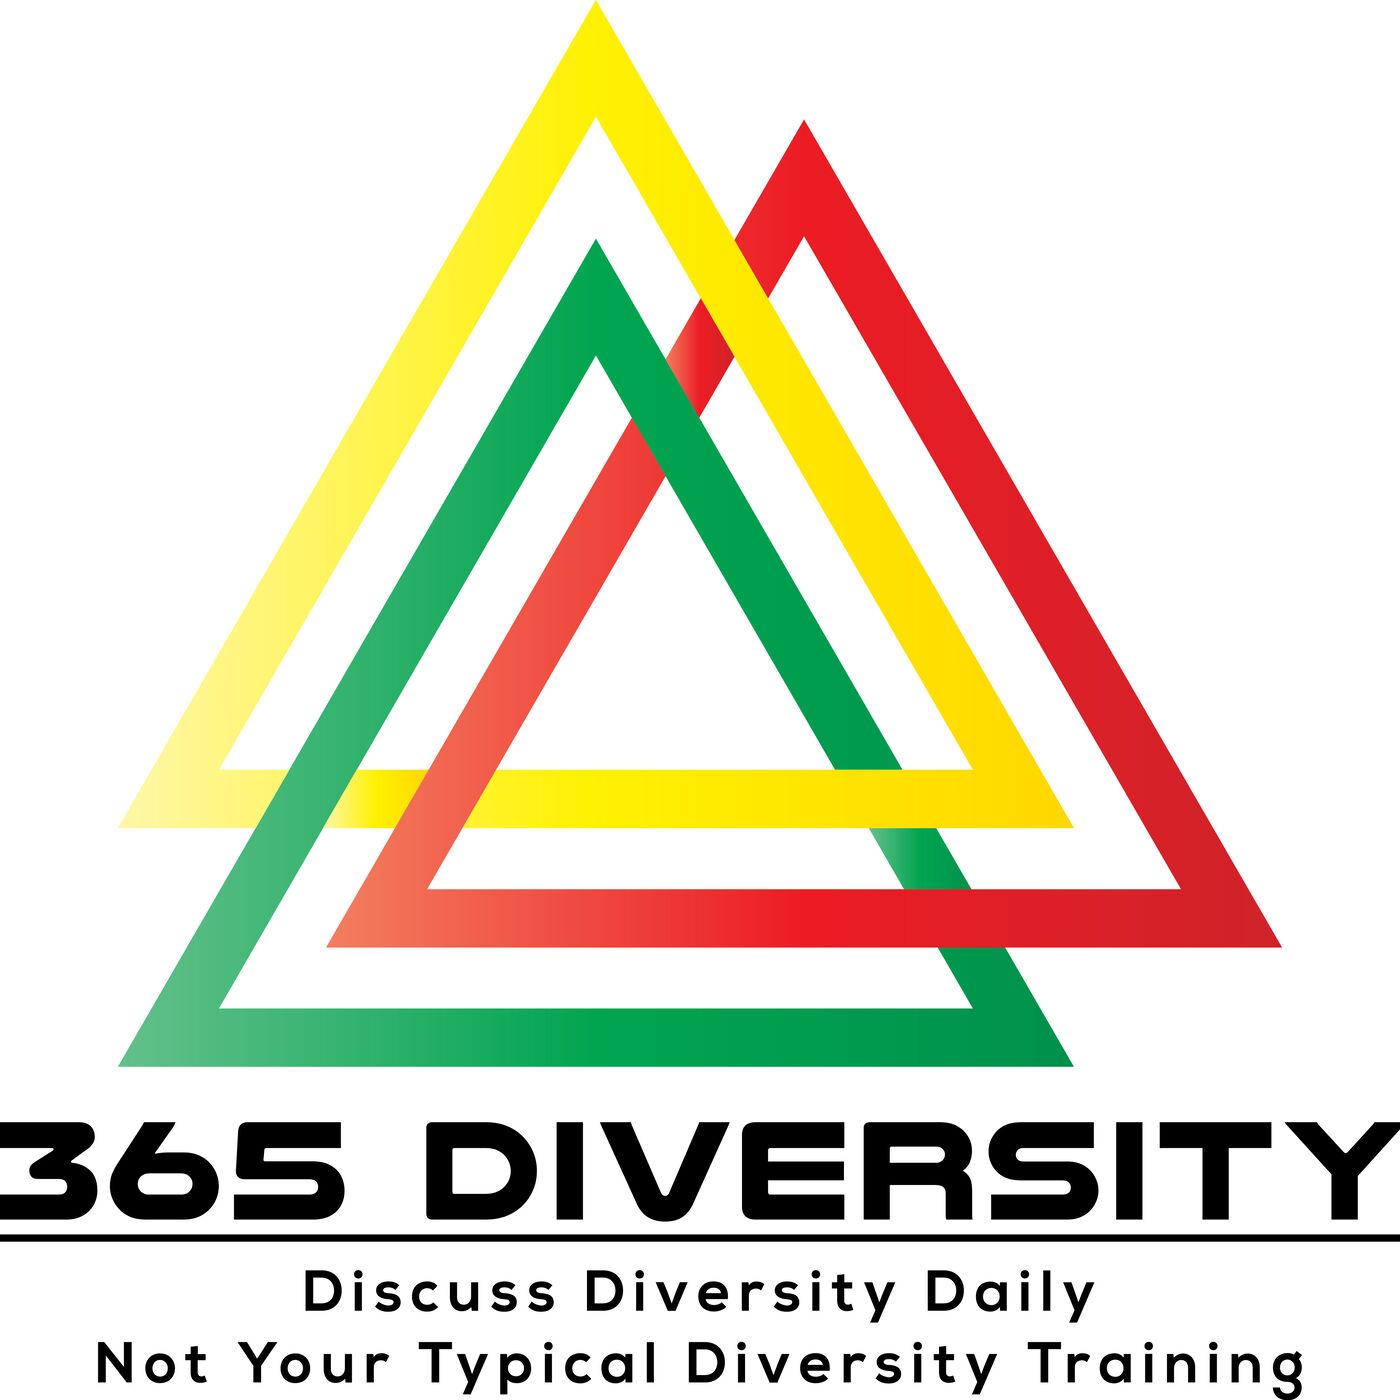 Episode 43: Diversity, inclusion, antiracism trainings, with Dr. Kimya Nuru Dennis, Part 2